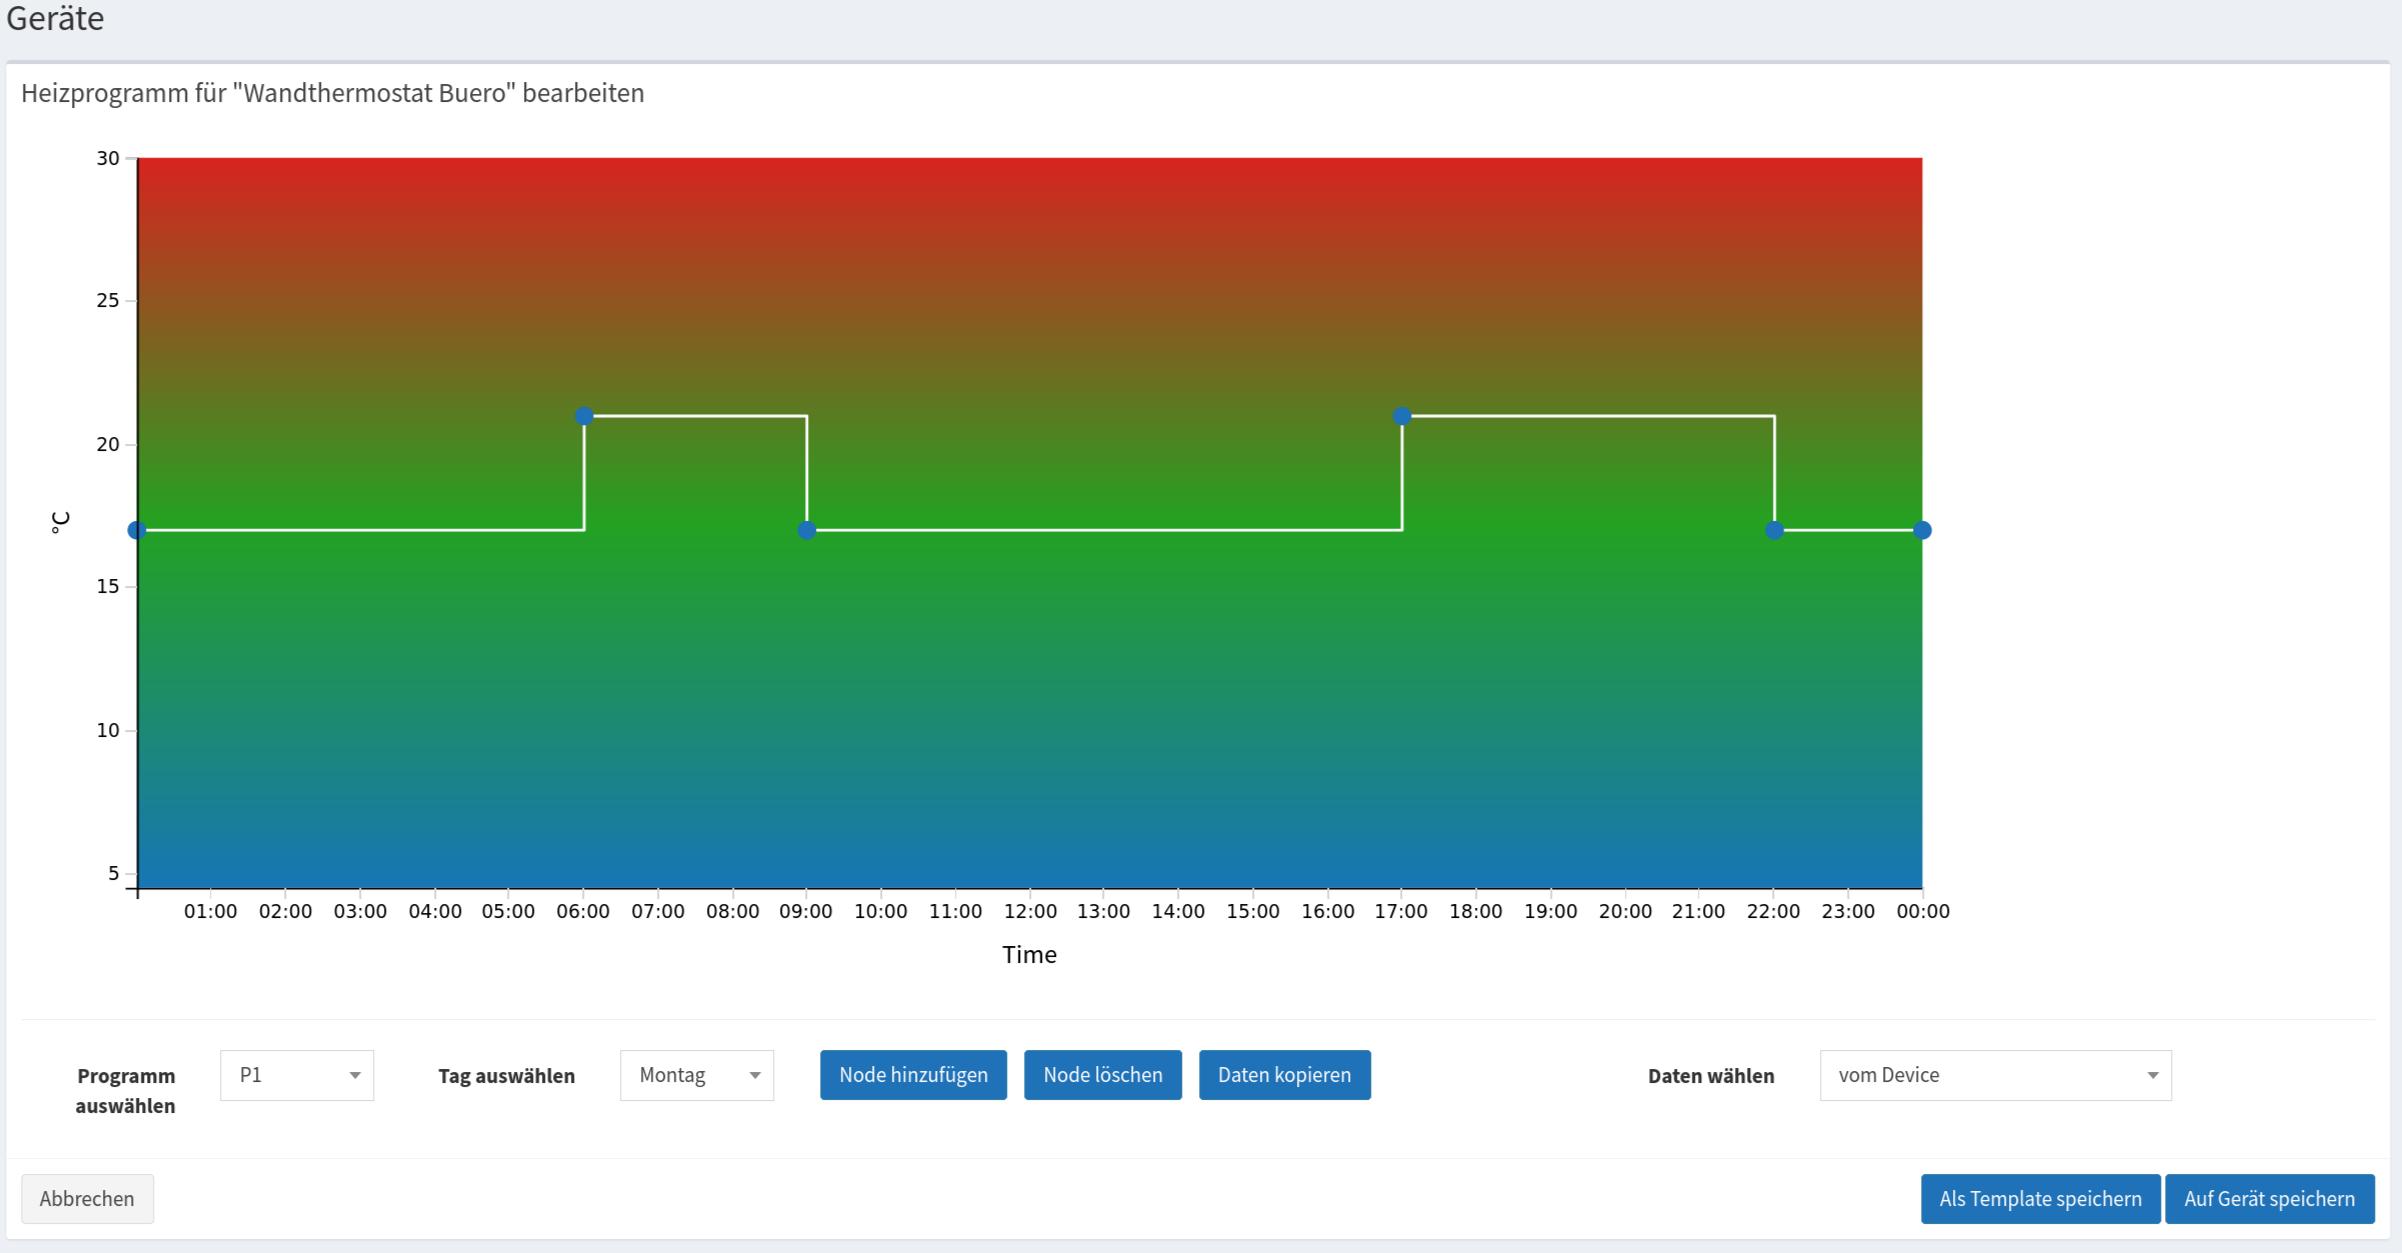 FireShot Capture 1234 - smartha Admin - Geräte - 192.168.111.71